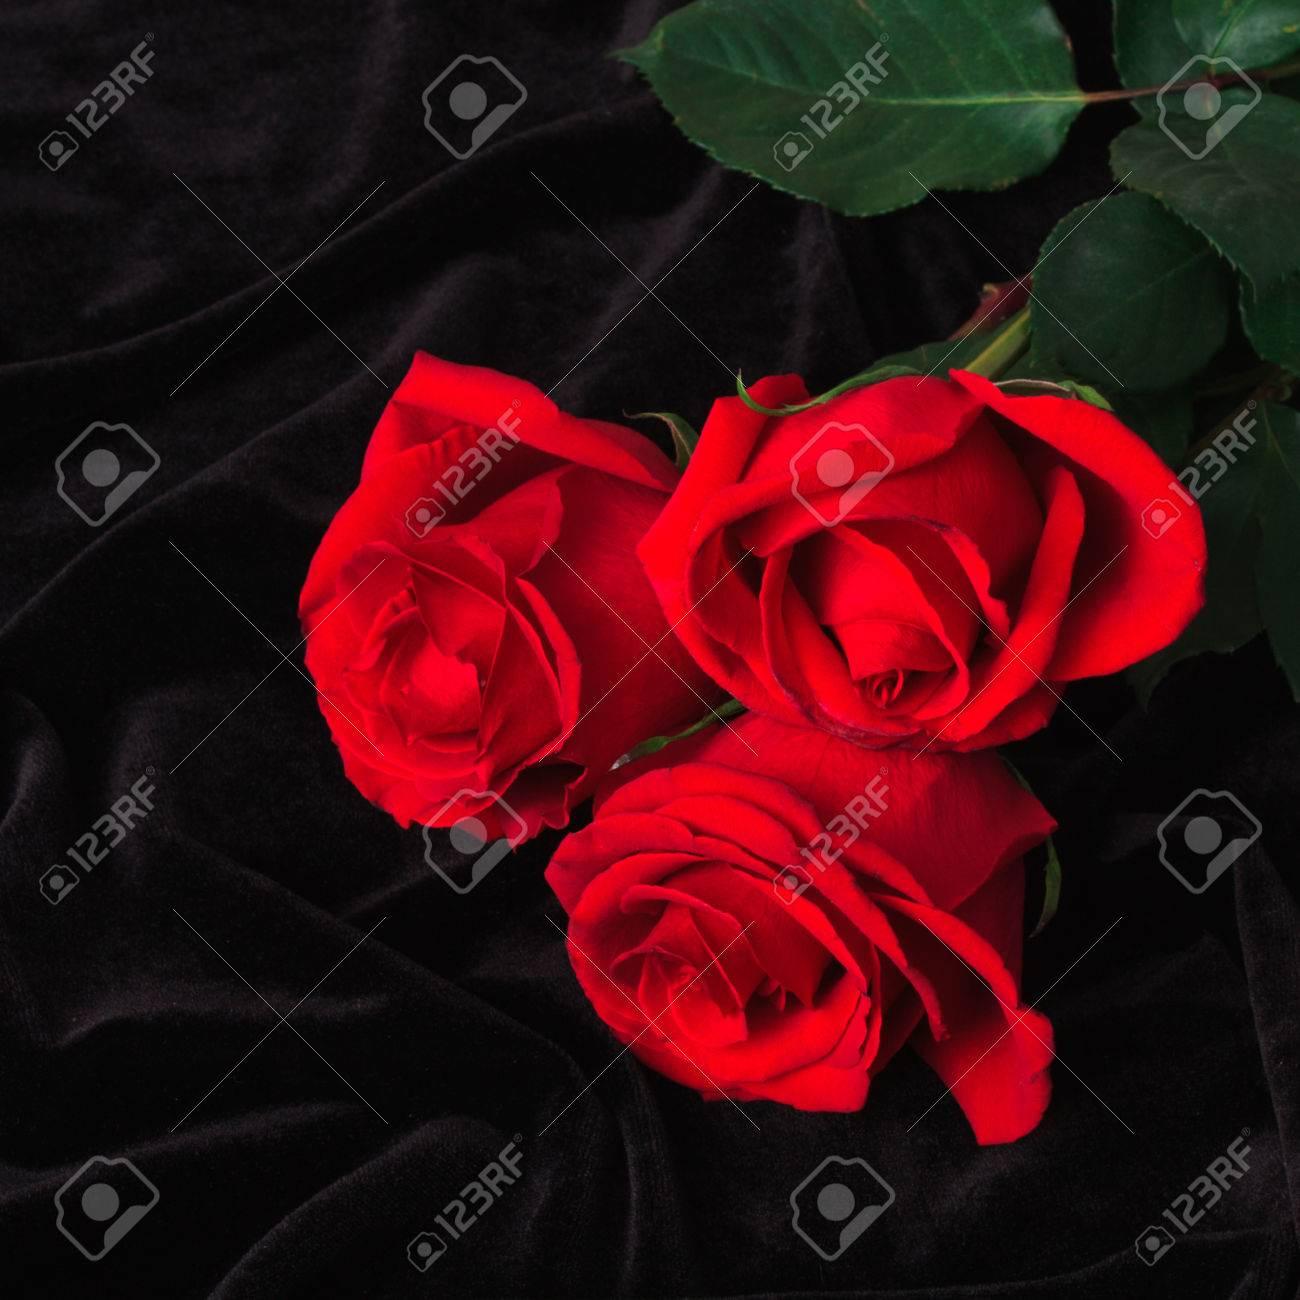 Beautiful red rose on black satin as background stock photo picture beautiful red rose on black satin as background stock photo 25909607 izmirmasajfo